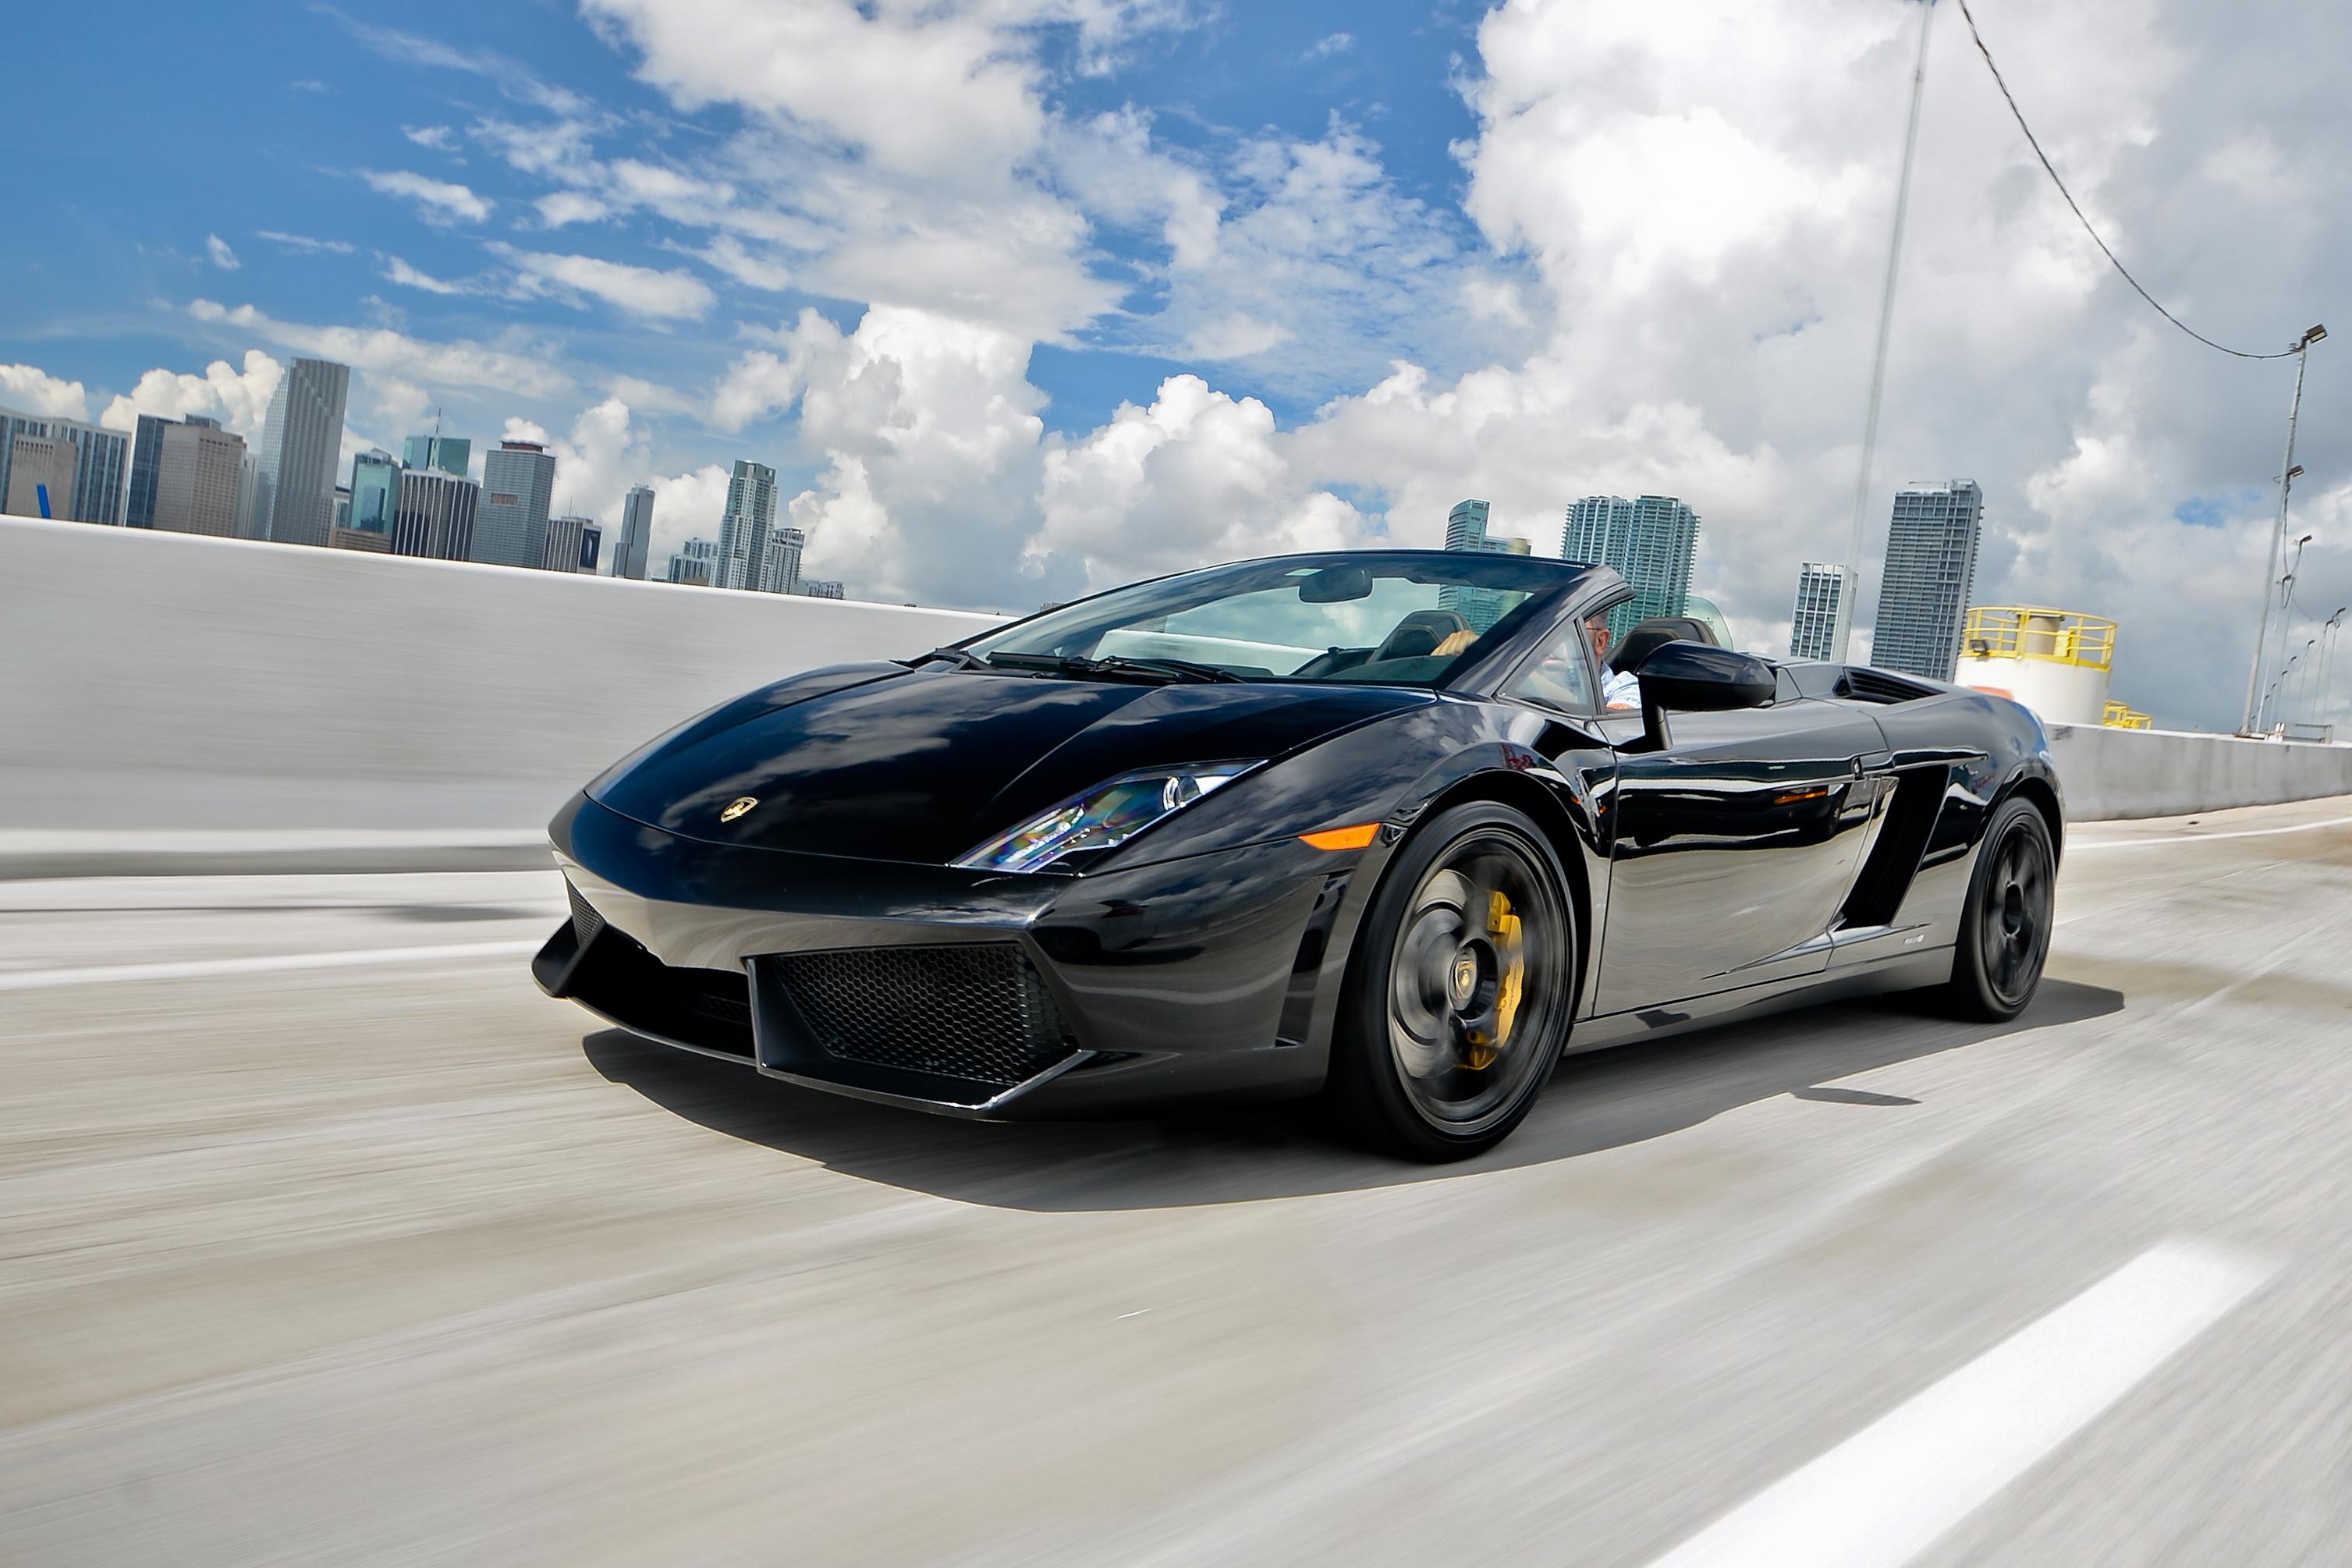 Rent Lamborghini Gallardo Spyder Near Miami South Beach Fl